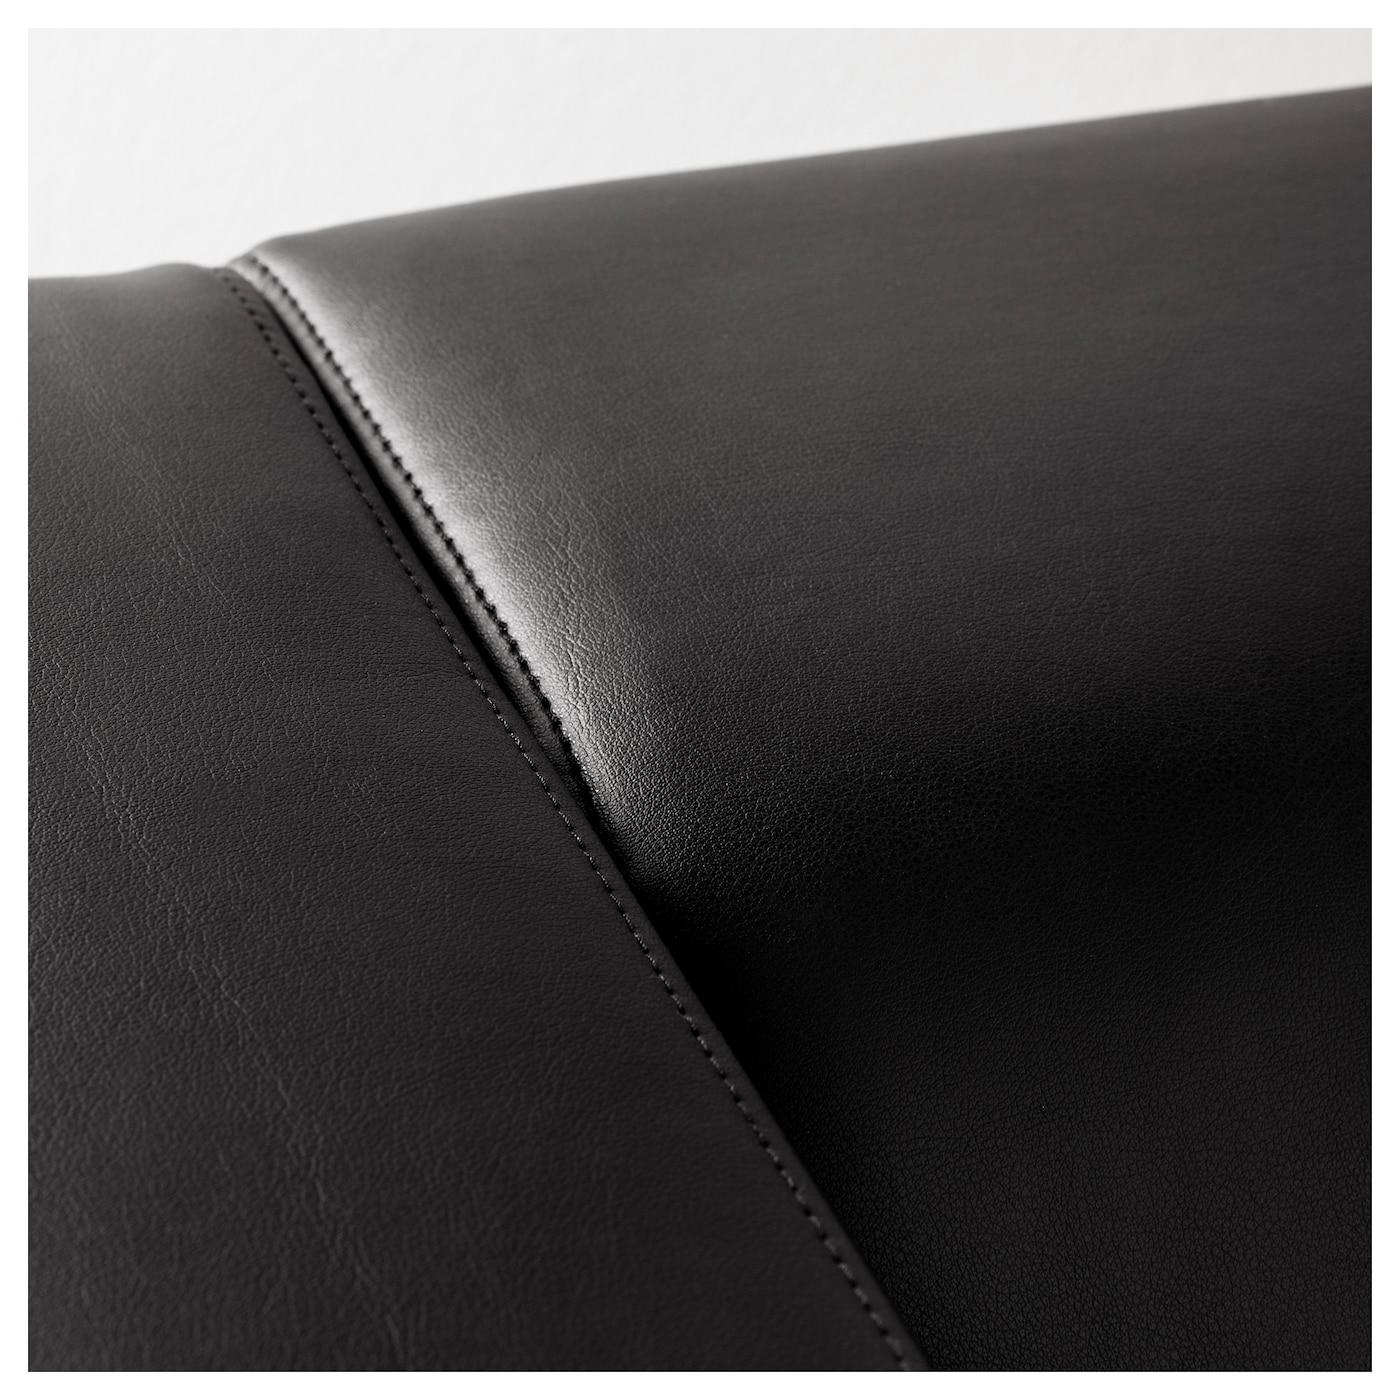 KLIPPAN Two seat sofa Kimstad black IKEA